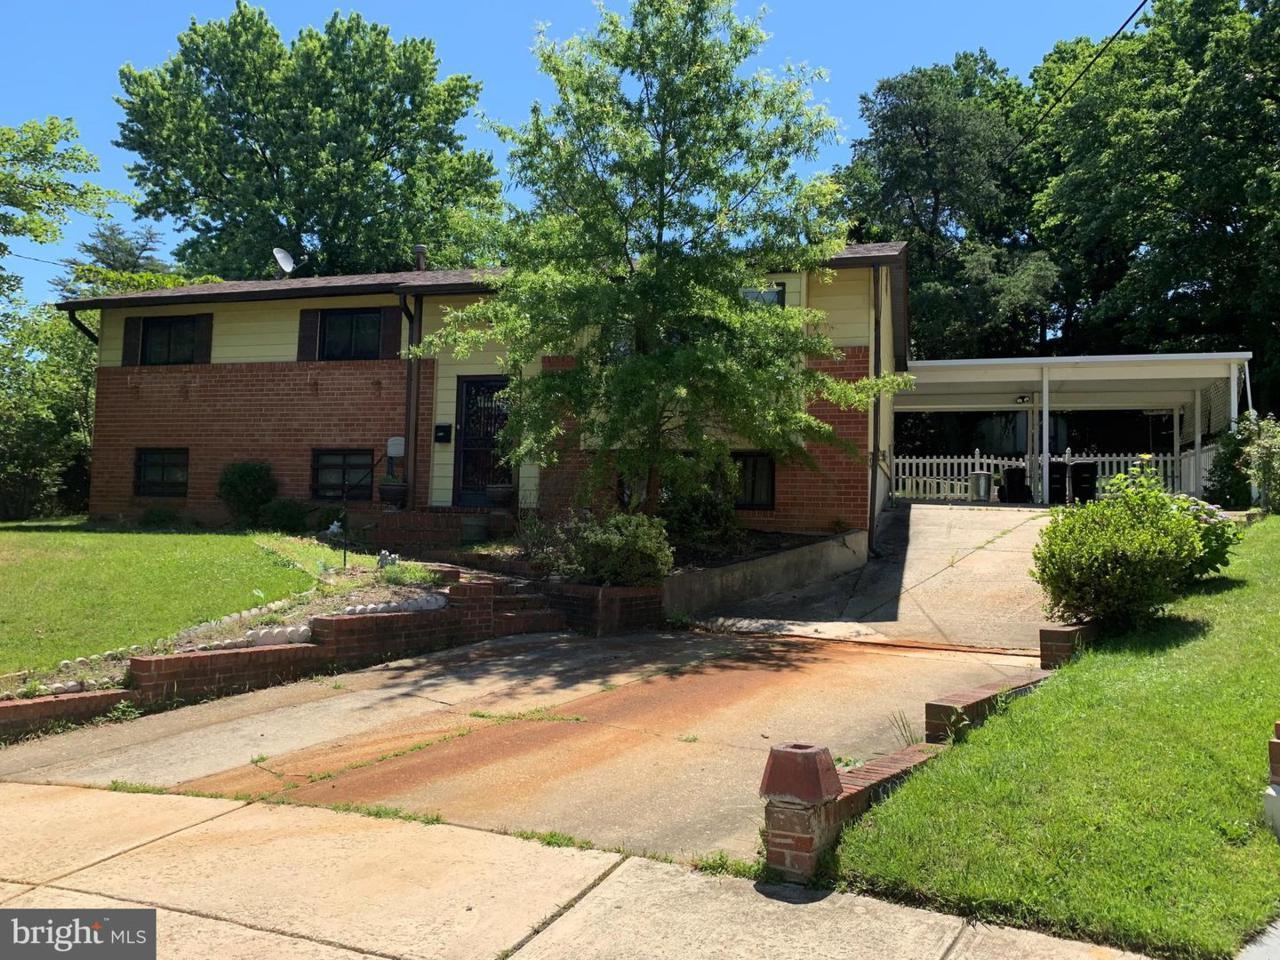 5802 Birchwood Court - Photo 1